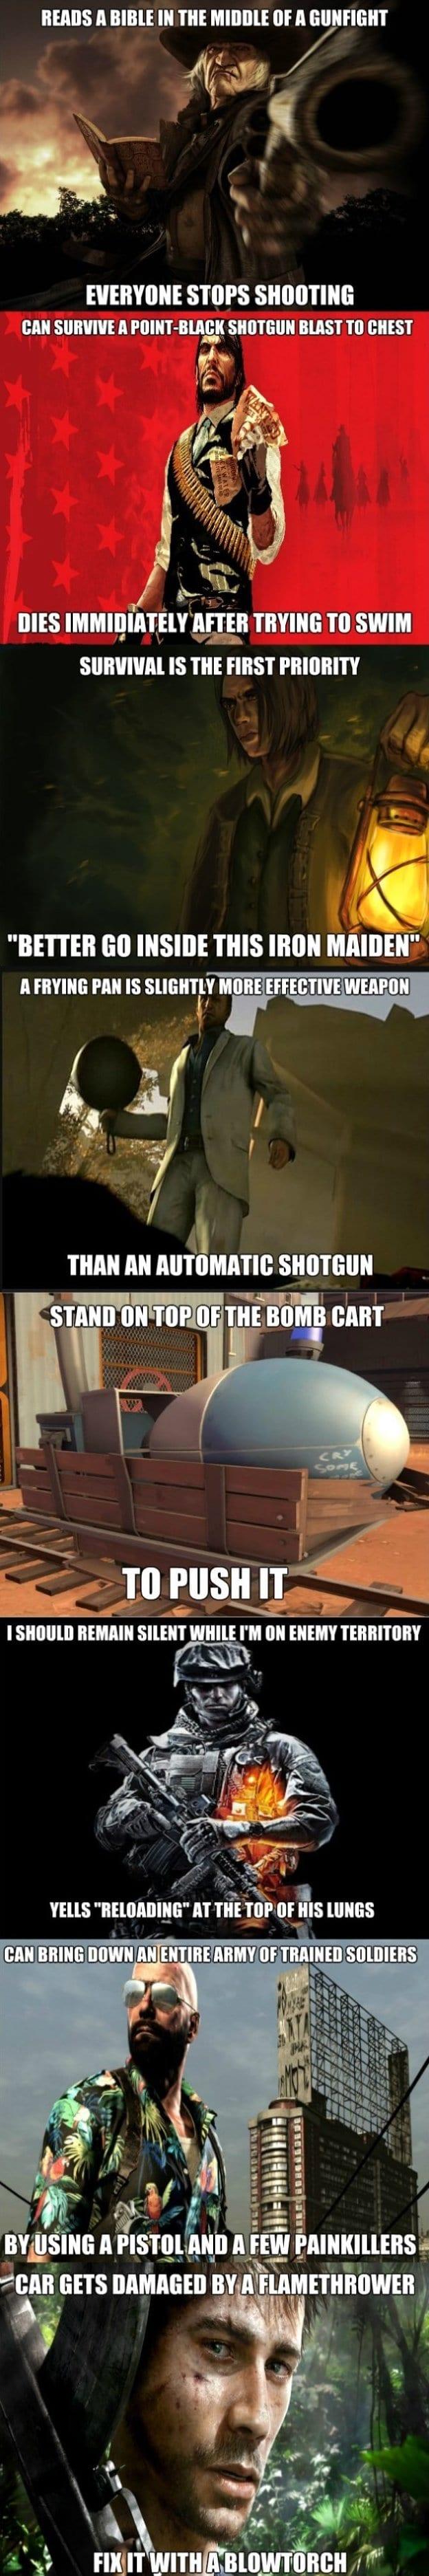 funny-game-logic-compilation